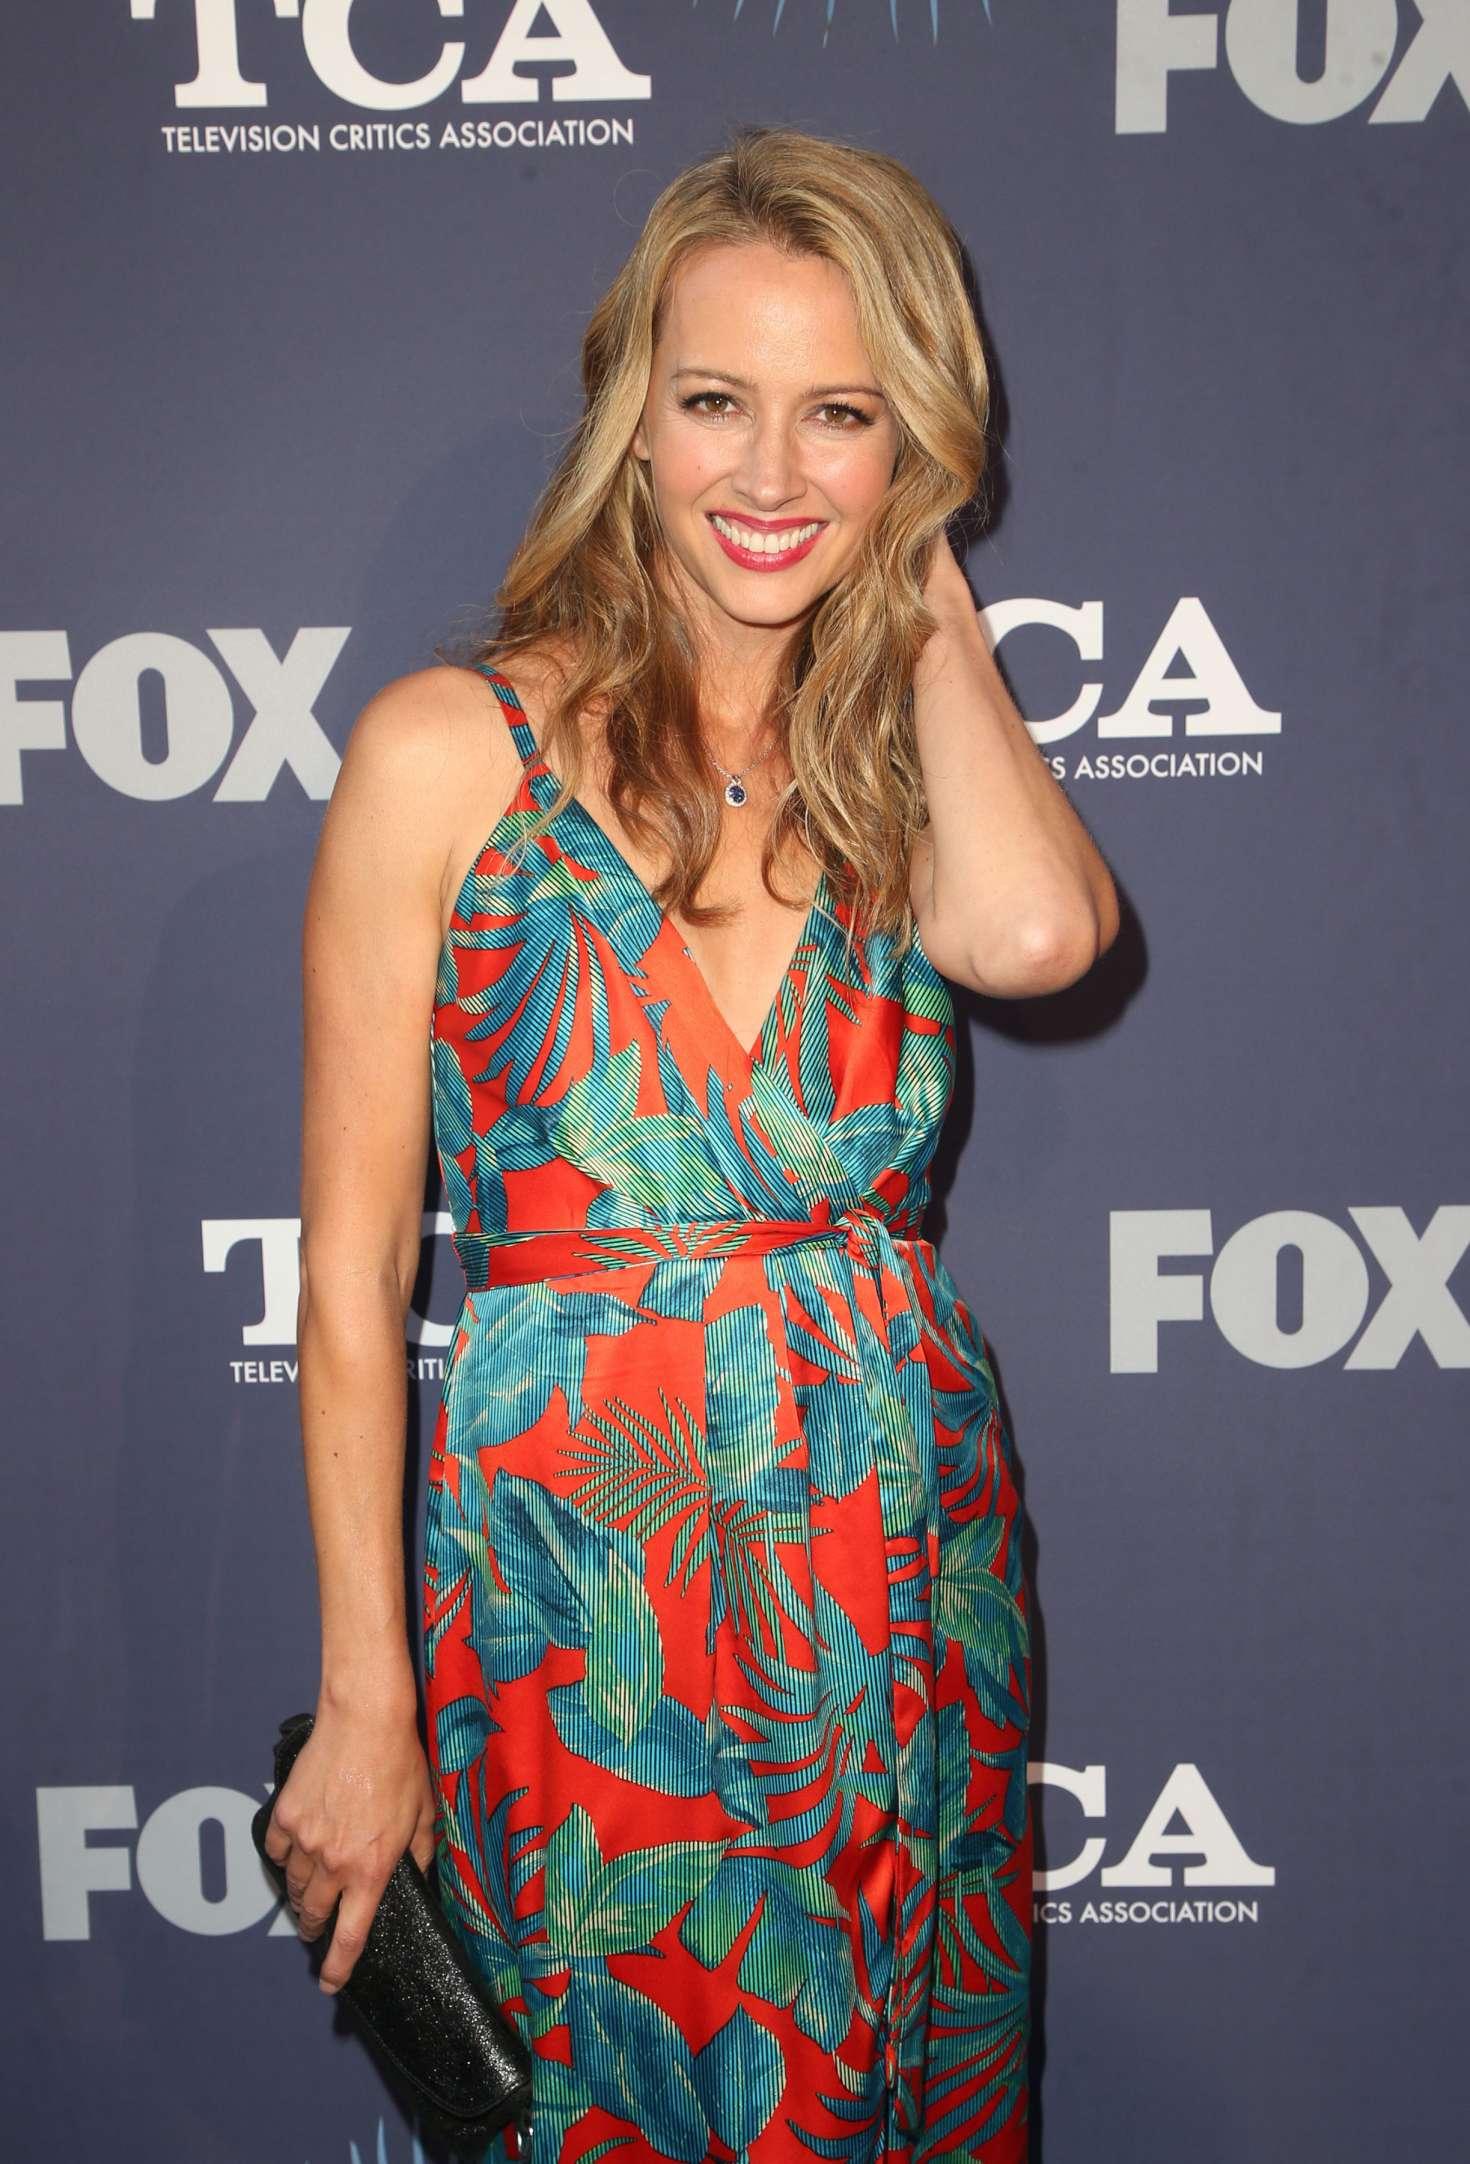 Amy Acker - 2018 FOX Summer TCA 2018 All-Star Party in LA